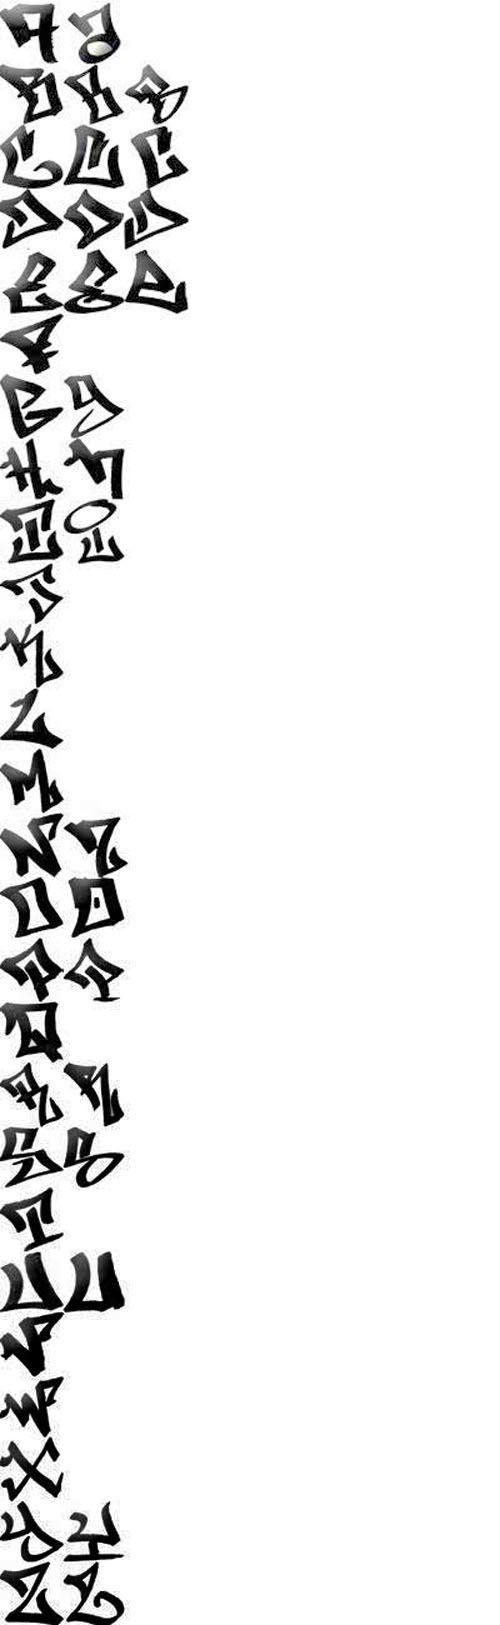 bway tags graffiti alphabet / graffiti alphabet letters , fonts and sketches « Art of Graffiti